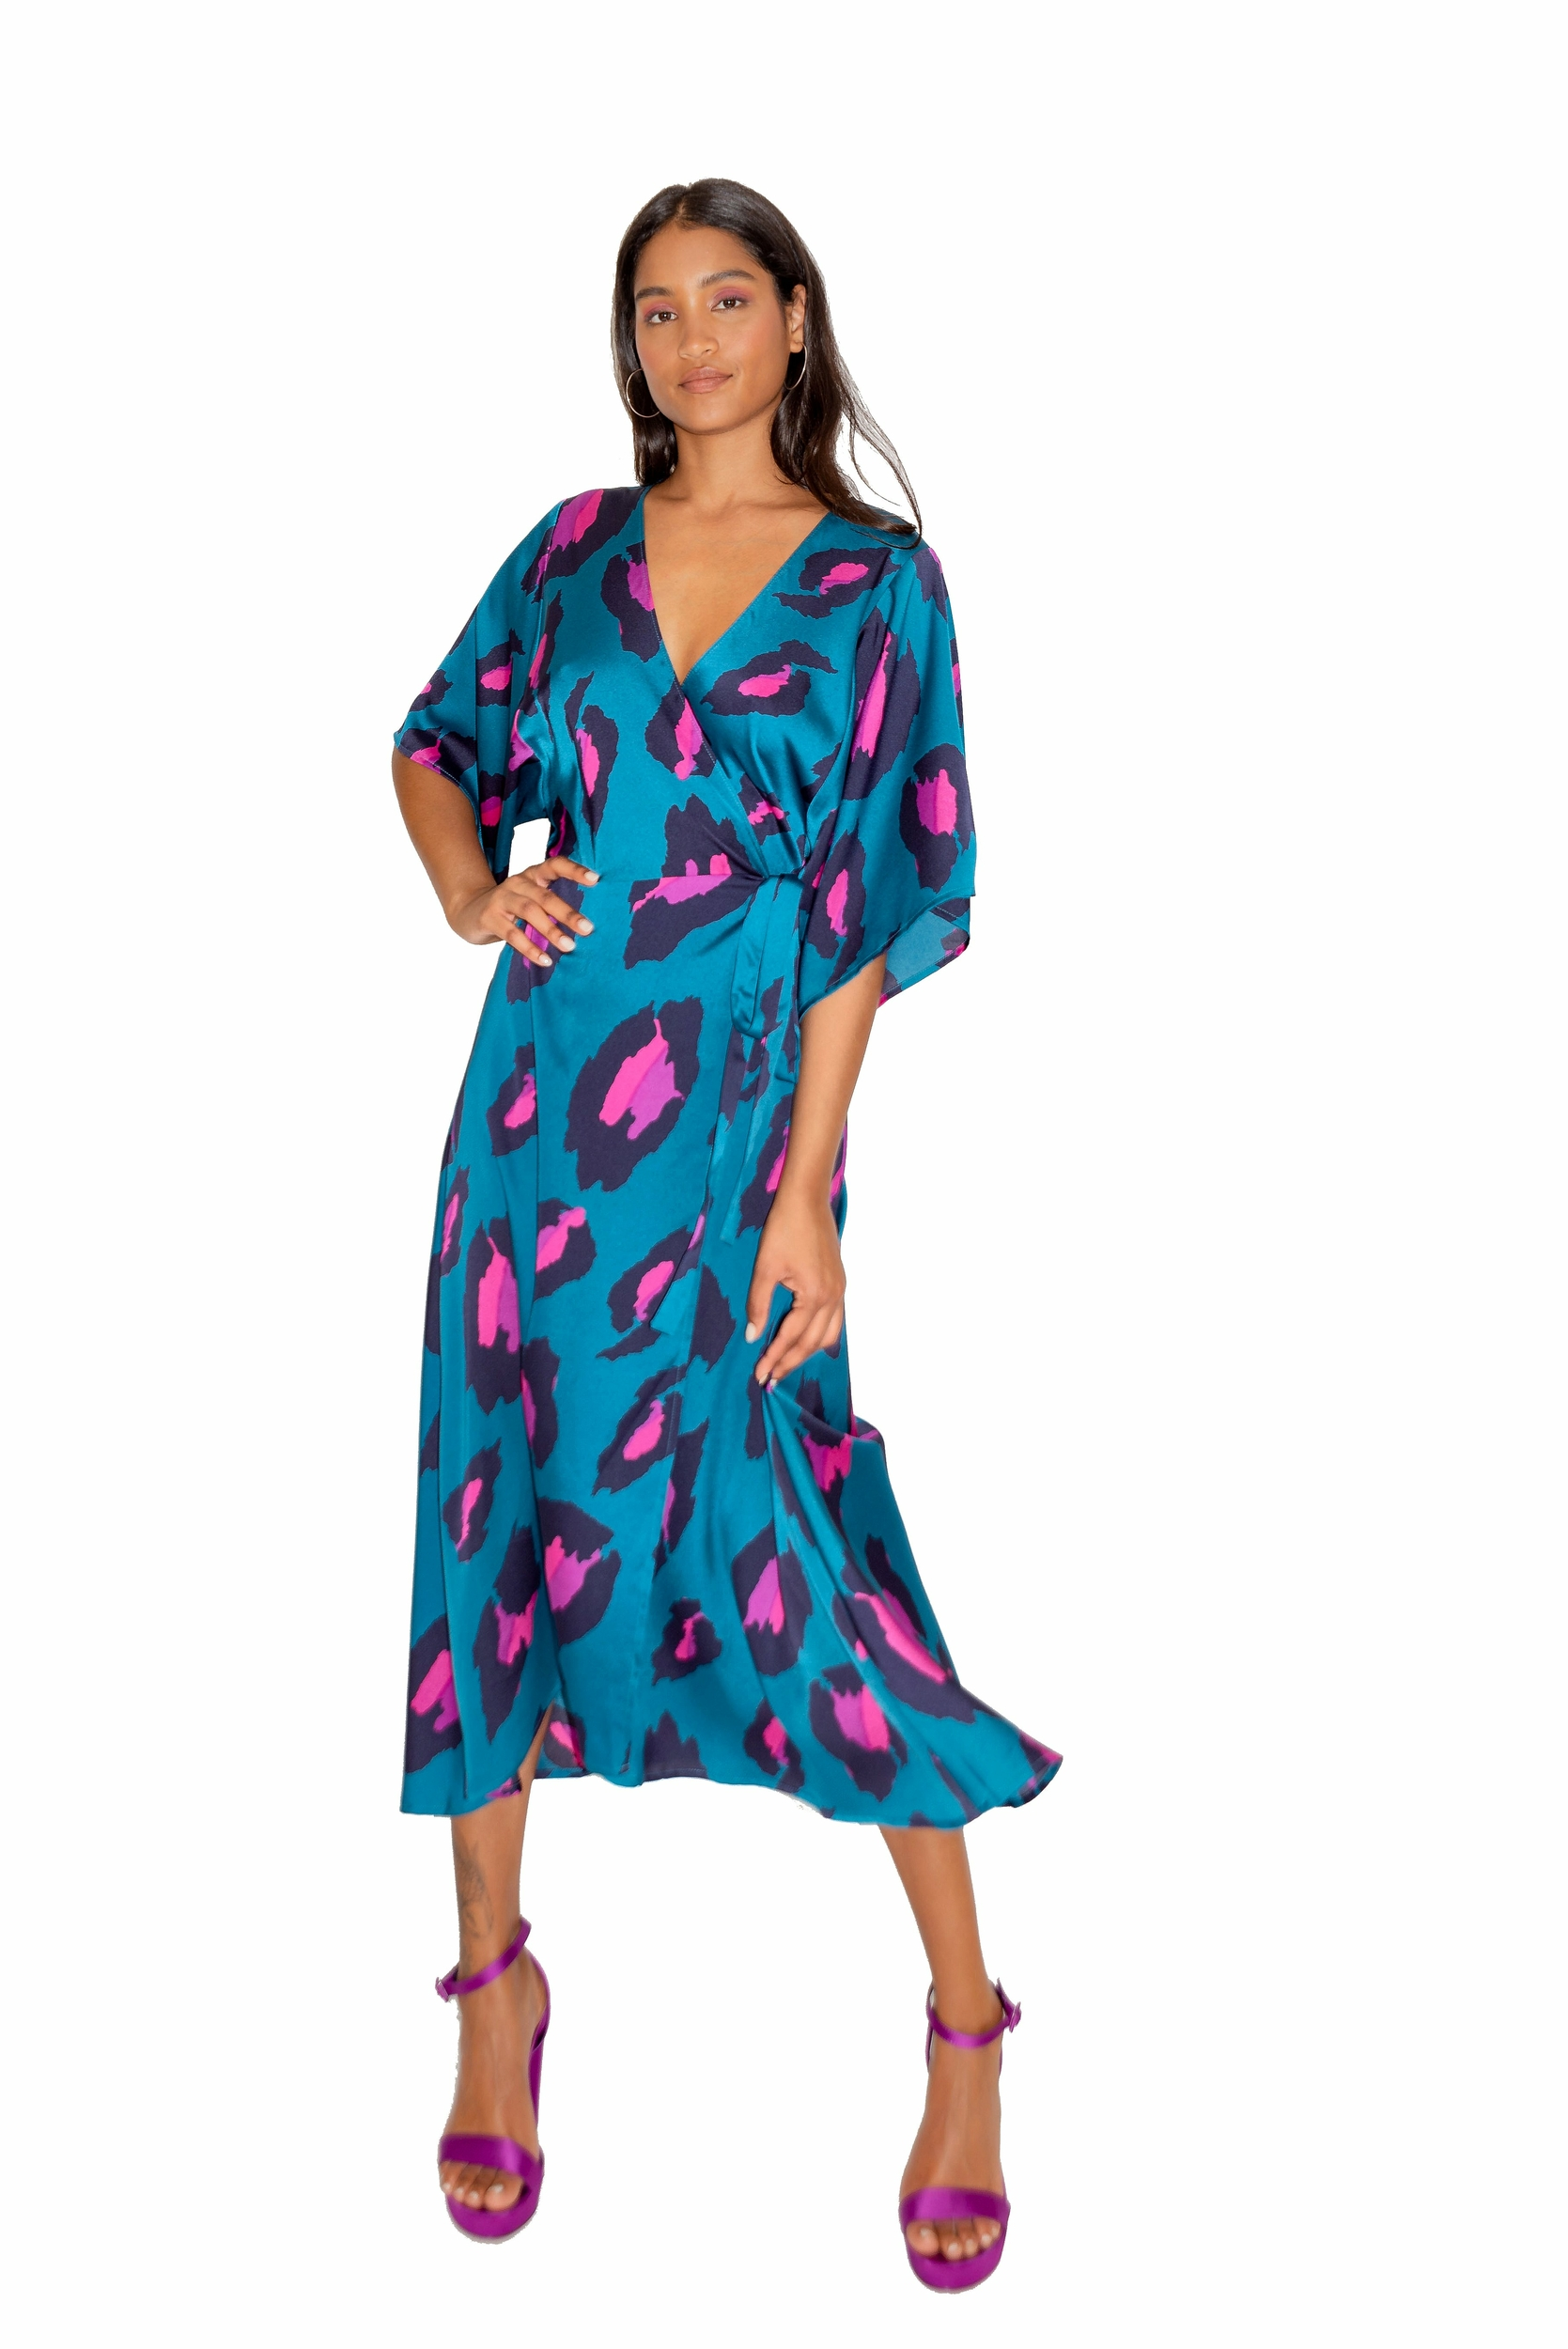 Robe Midi Portefeuille Léopard à Manches Kimono Bleu Rose